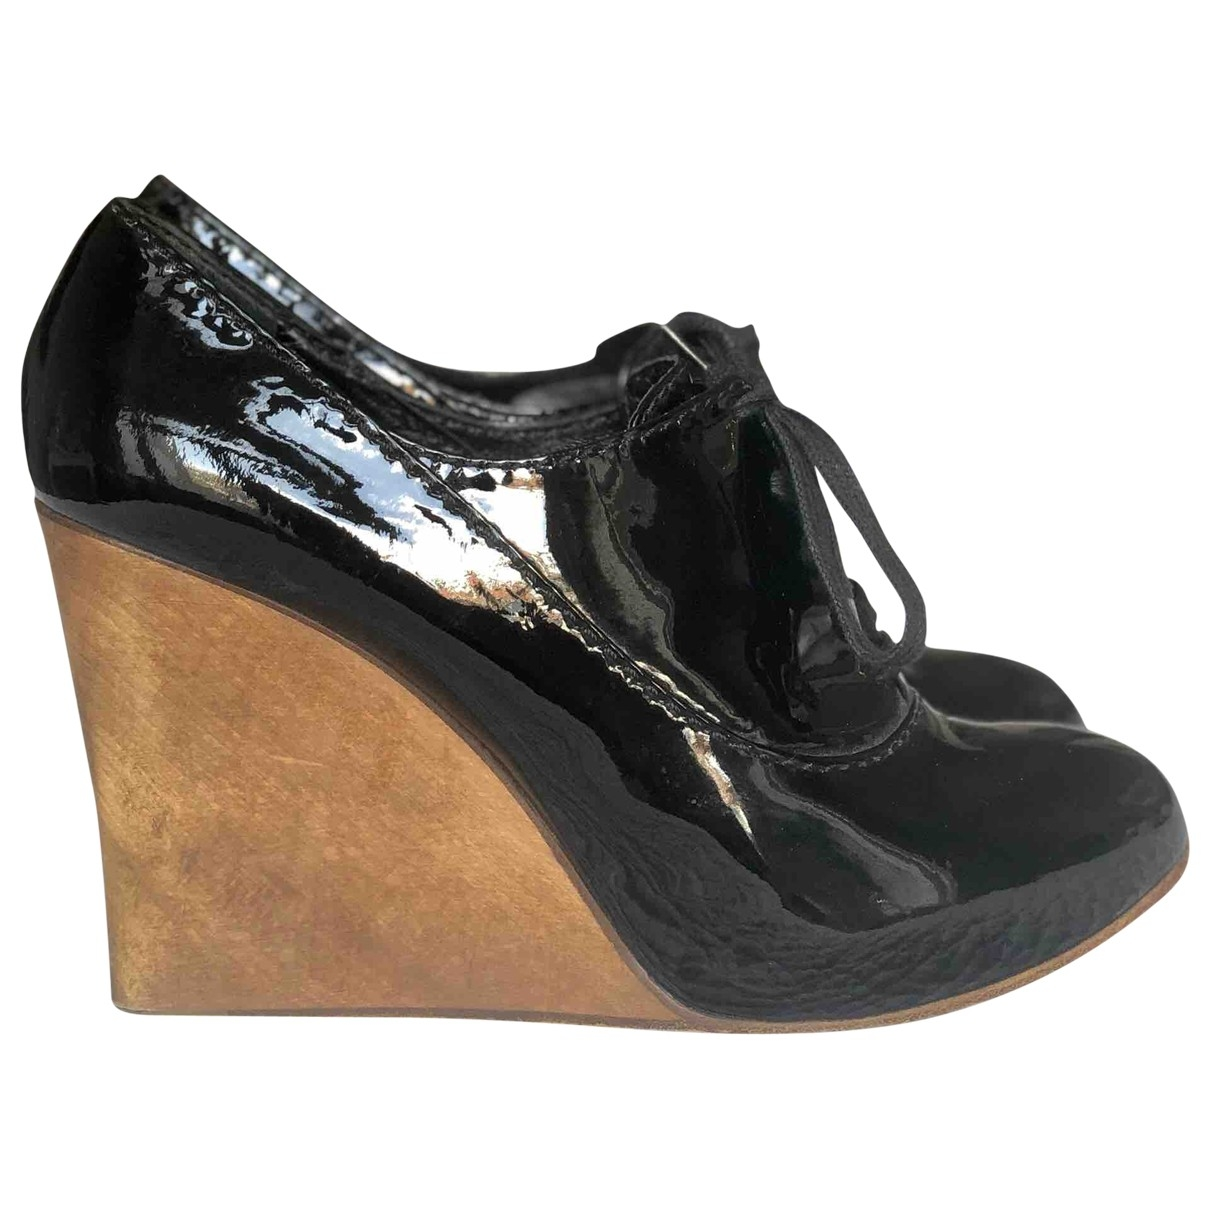 Chloé \N Black Patent leather Lace ups for Women 39 EU